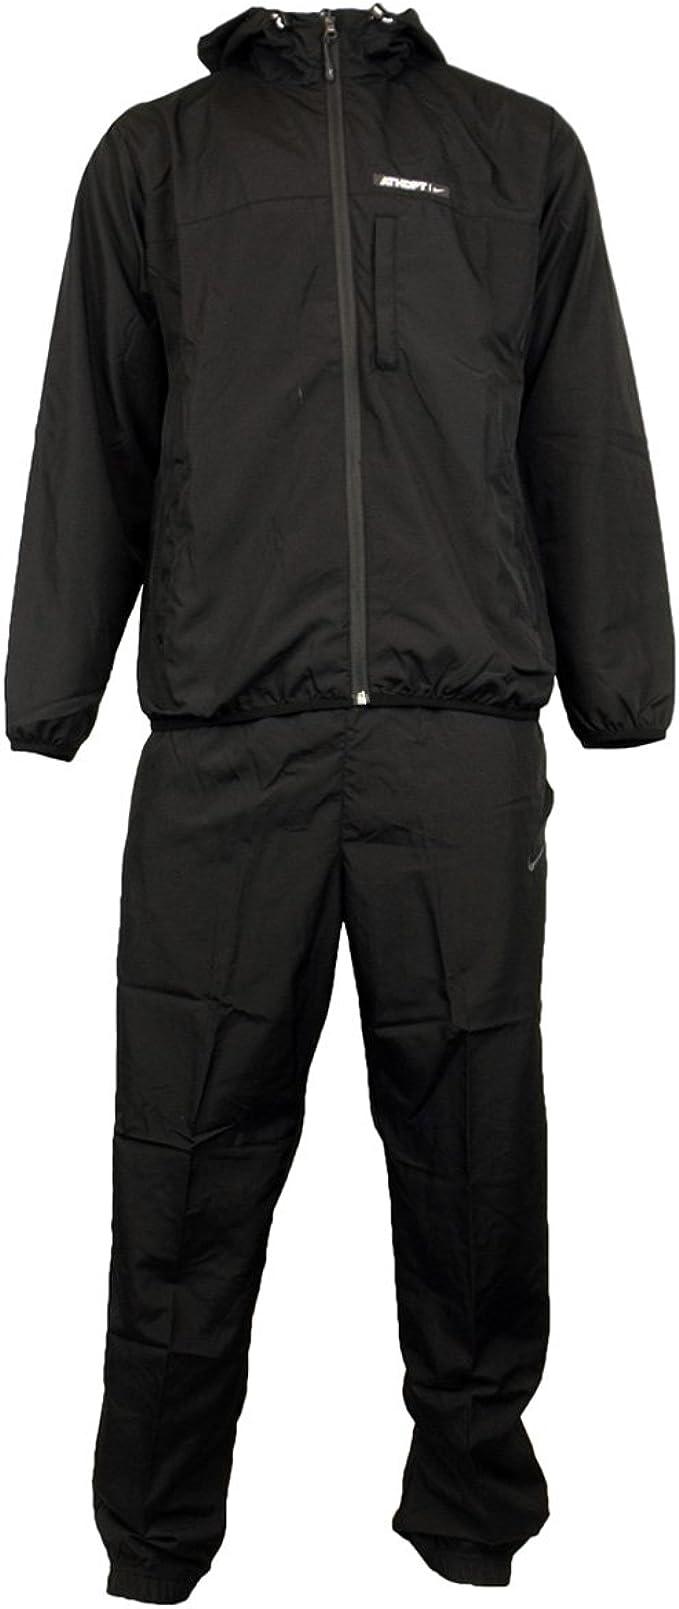 Nike para Hombre AD Pocket Full Chándal Carcasa híbrida Traje de ...